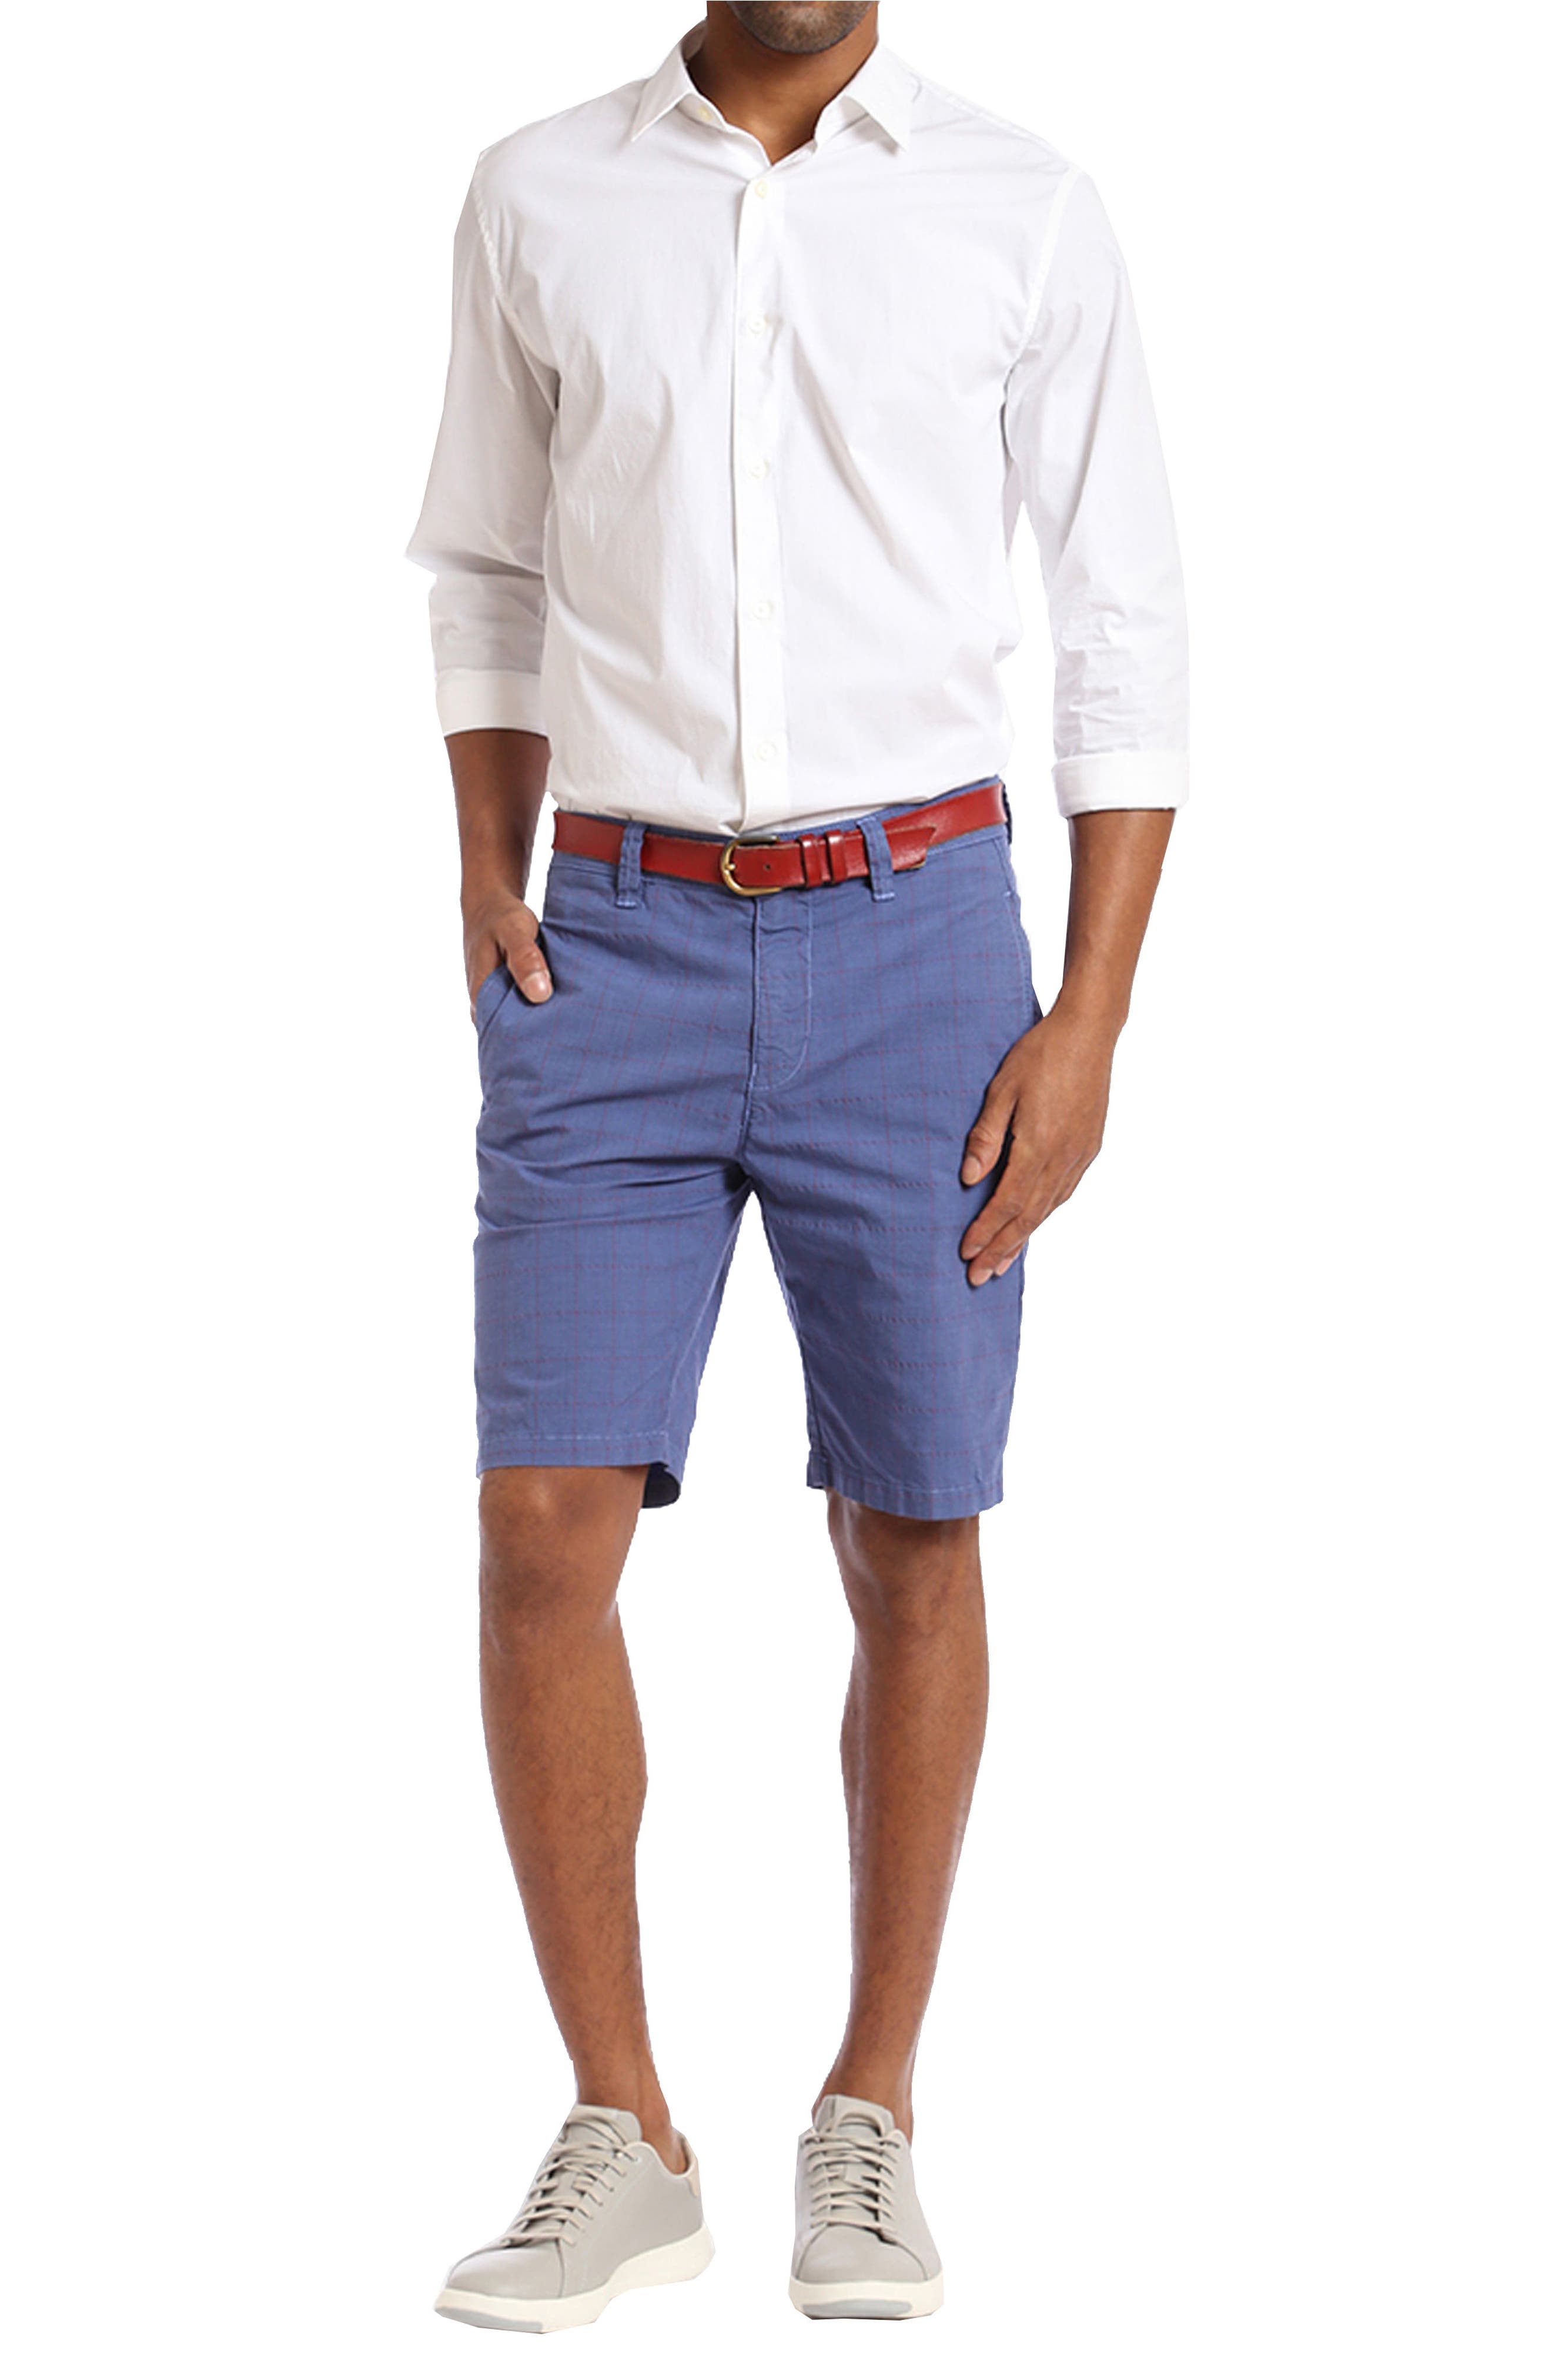 Nevada Twill Shorts,                             Alternate thumbnail 4, color,                             INDIGO PLAID